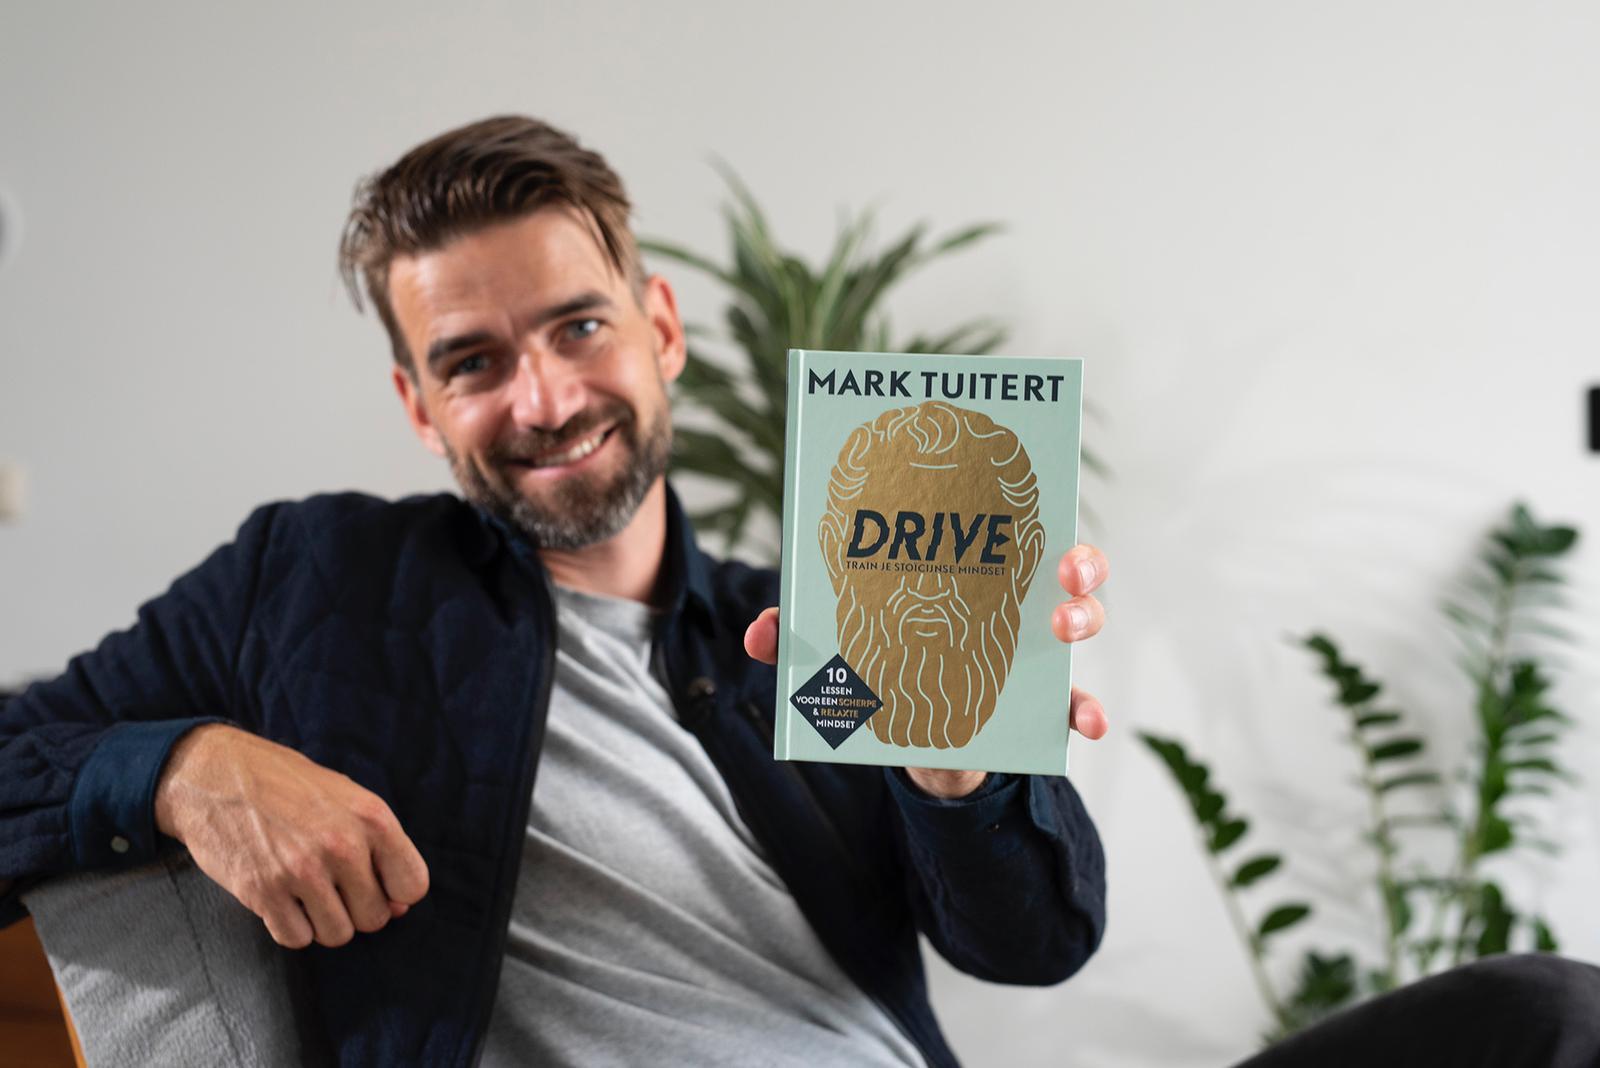 mark tuitert, drive, boek, stoicisme, filosofie